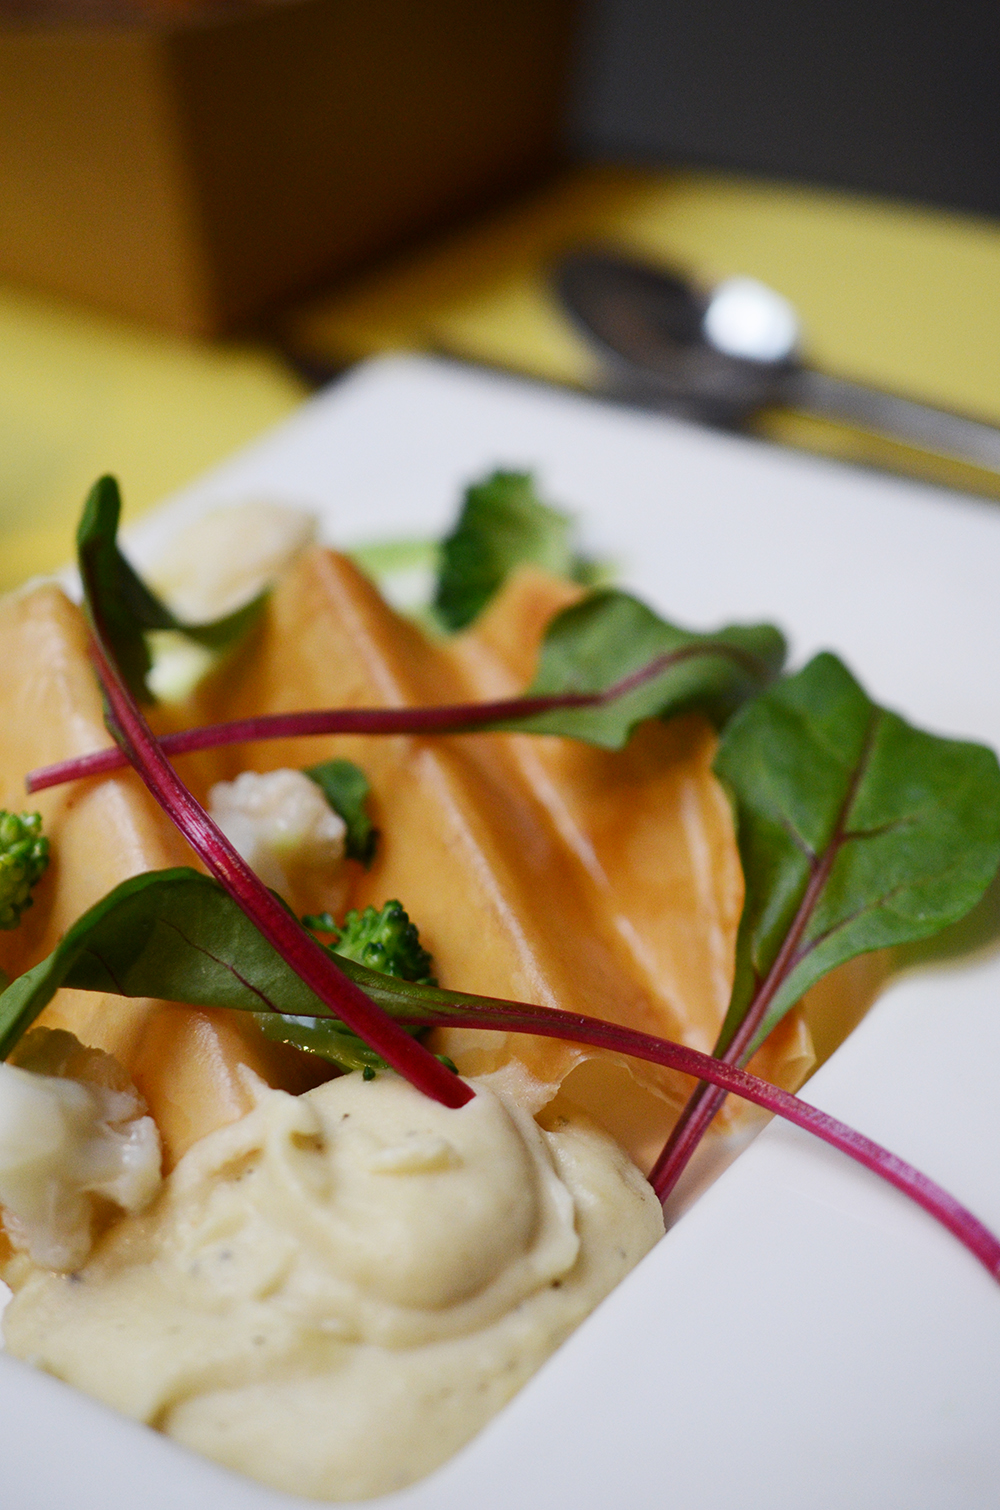 montjul_restaurant_paris_fernande_rené_blog_entree_mousse_celeri